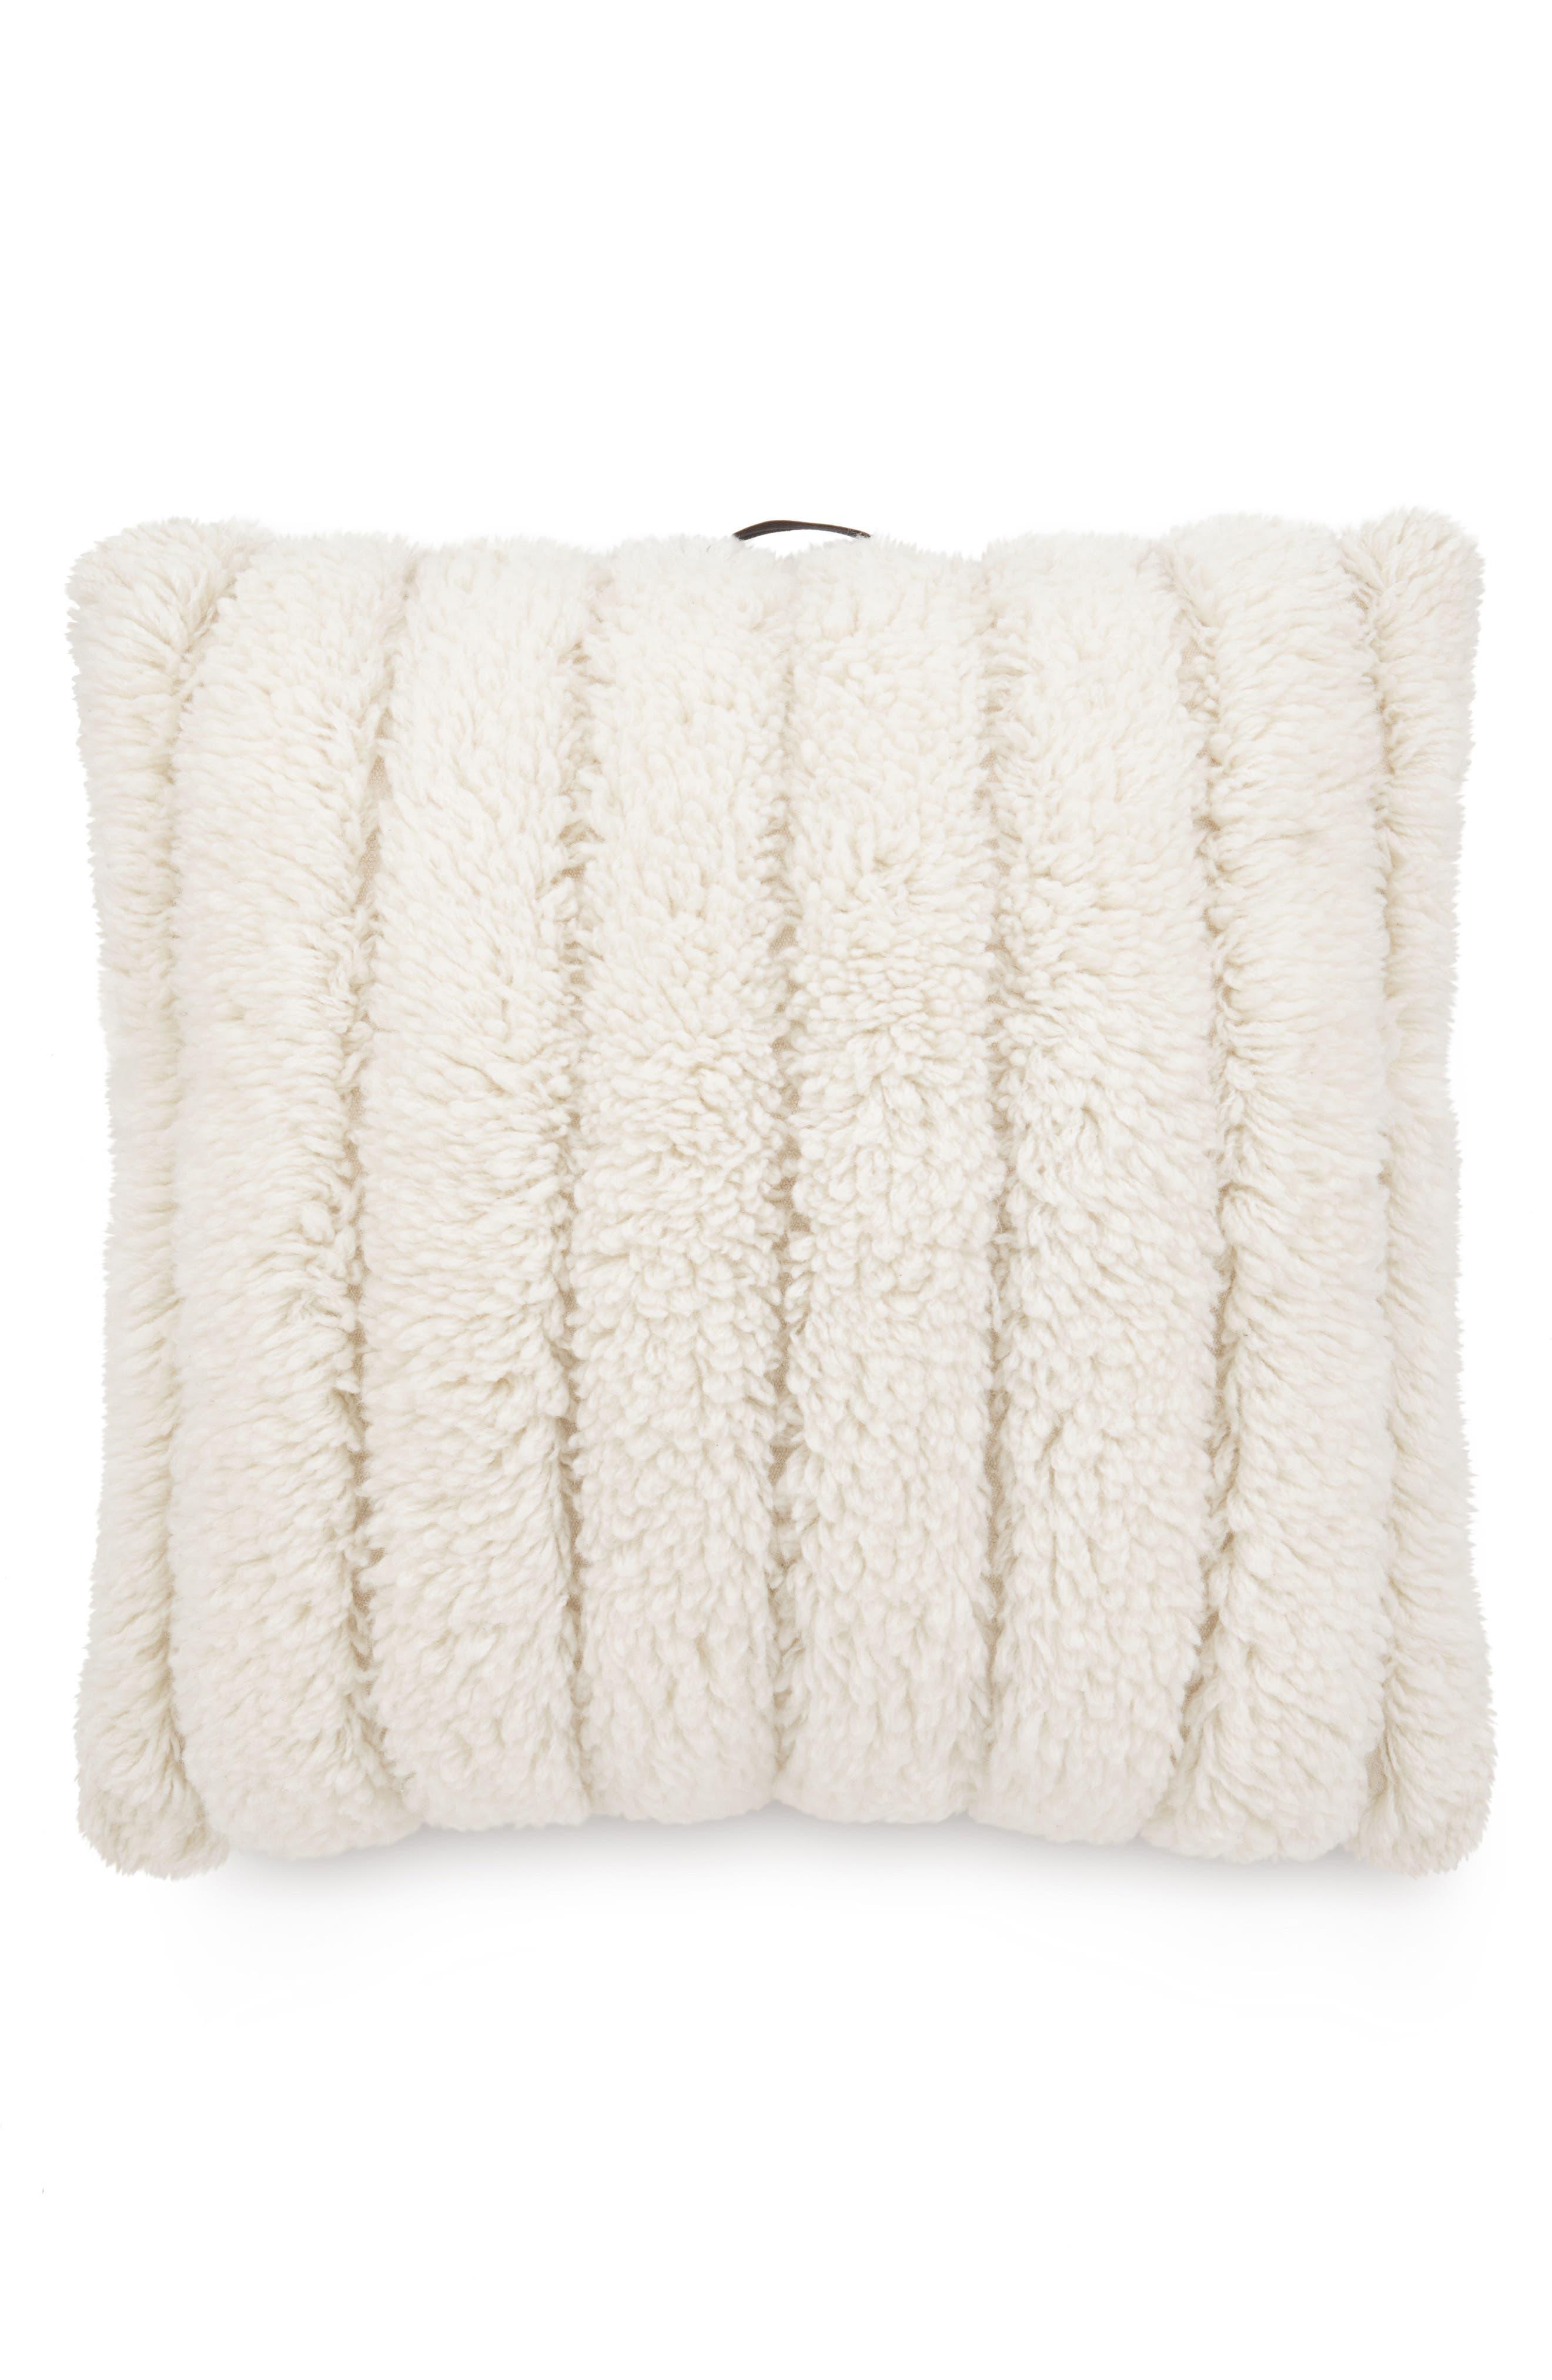 Main Image - UGG® Tufty Yarn Pillow